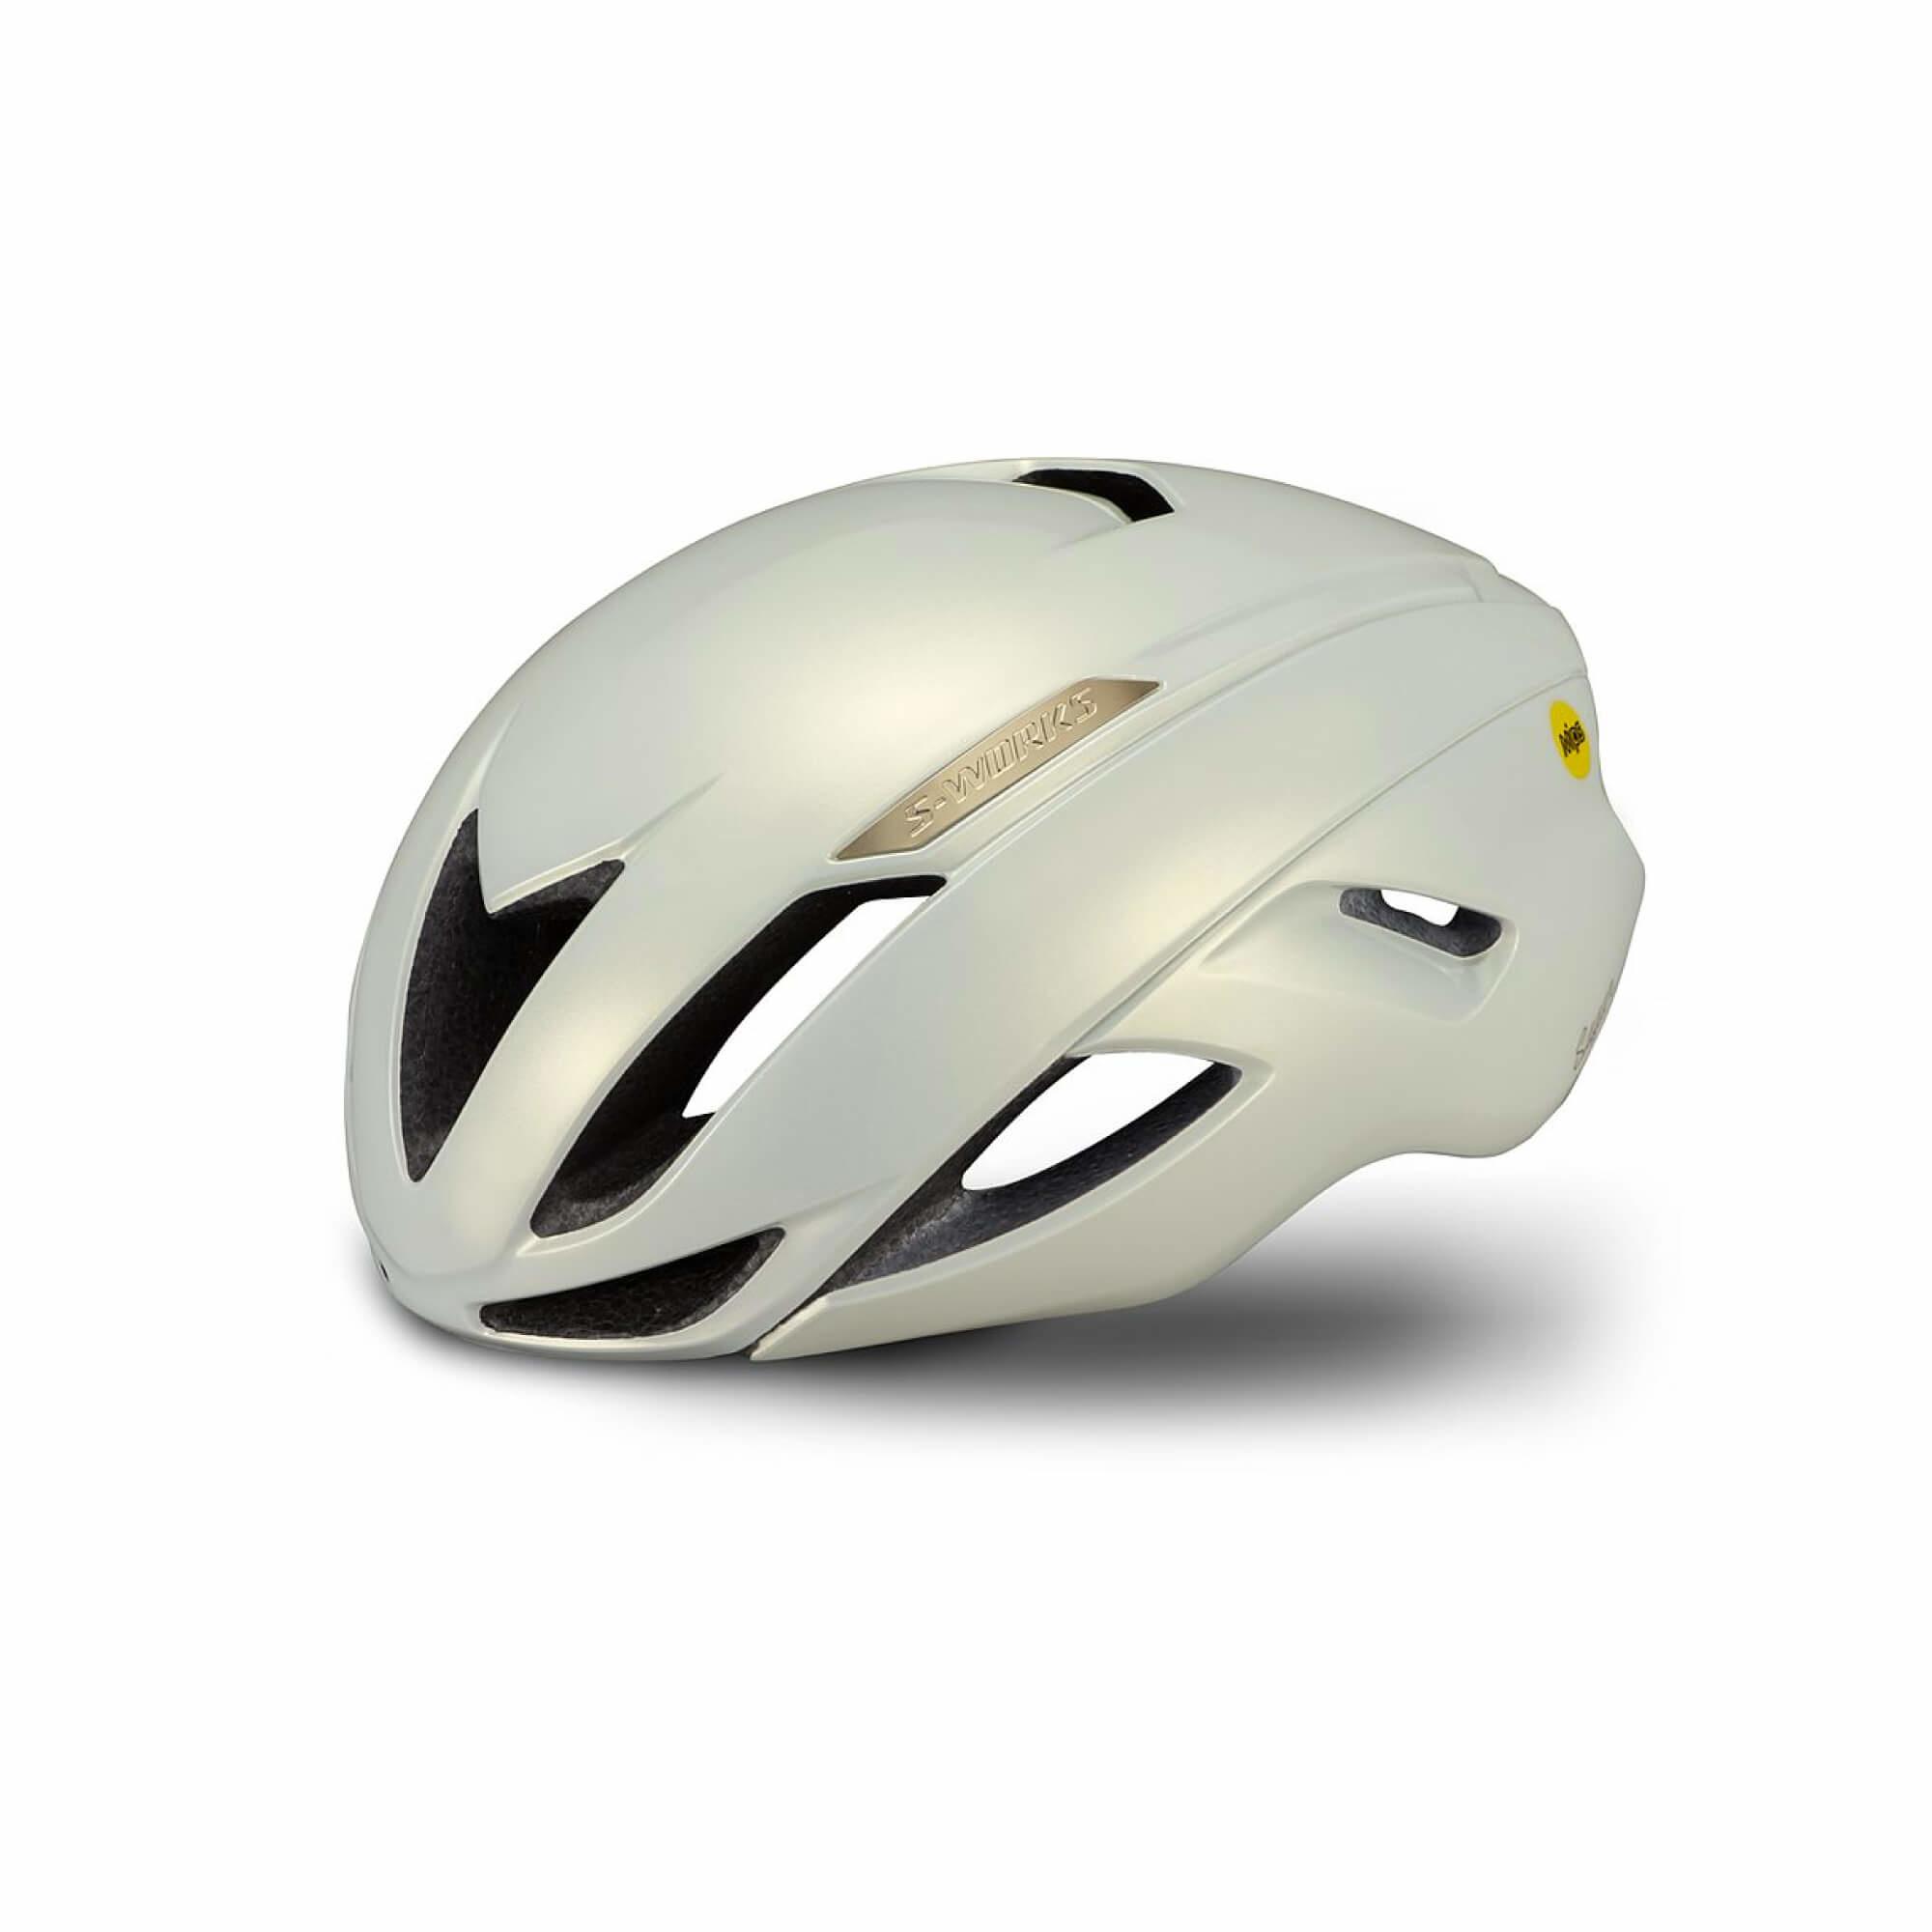 S-Works Evade II Helmet Angi Mips Sagan Disruption 2022-1